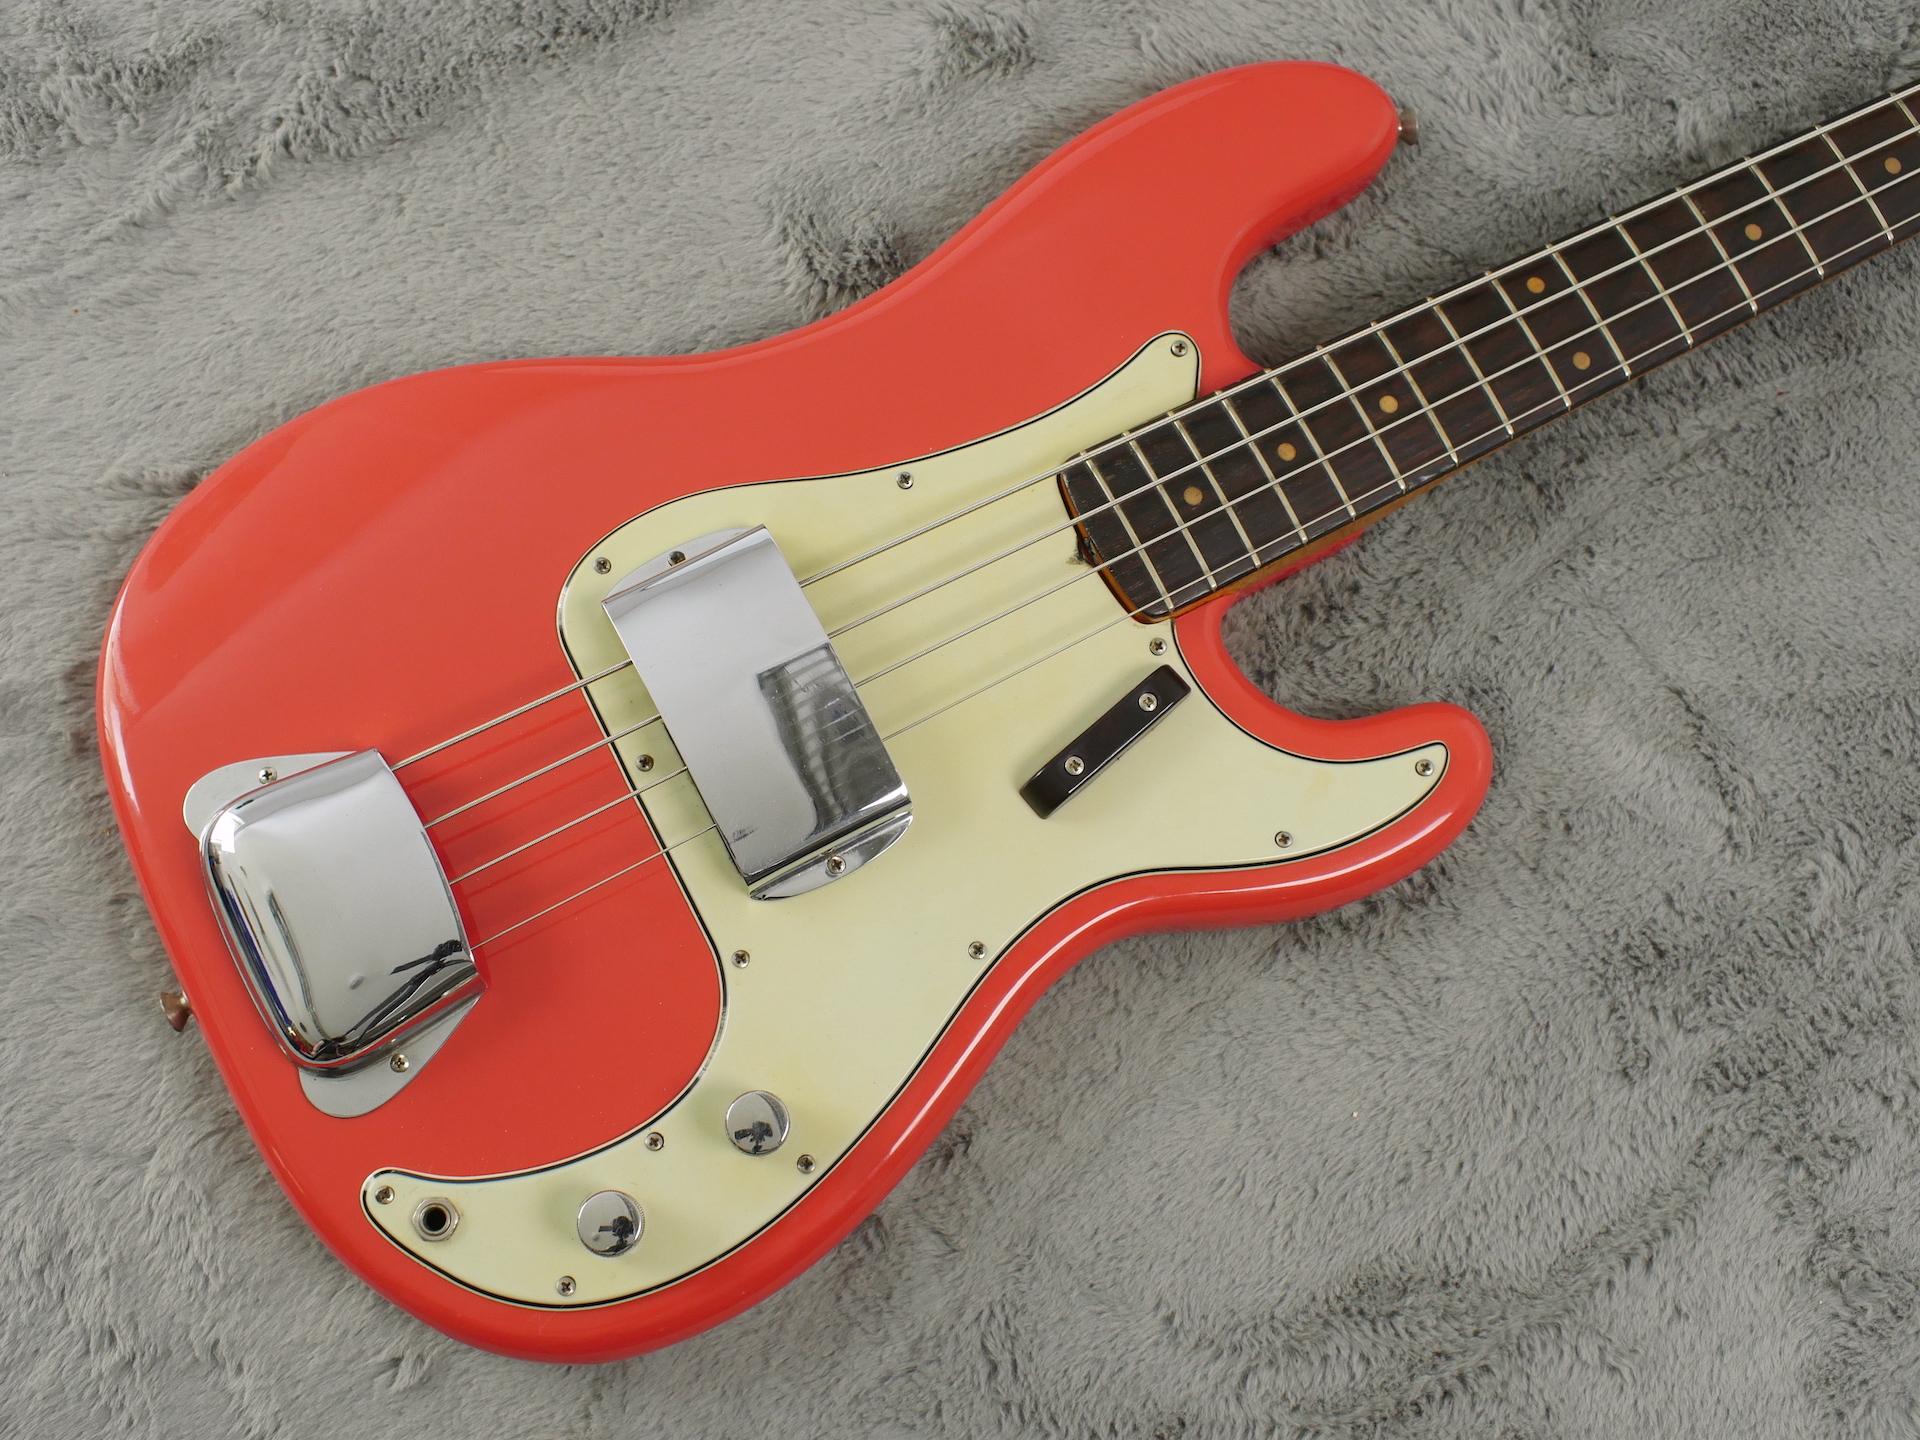 1963 Fender Precision Bass Fiesta Red body Refin + HSC